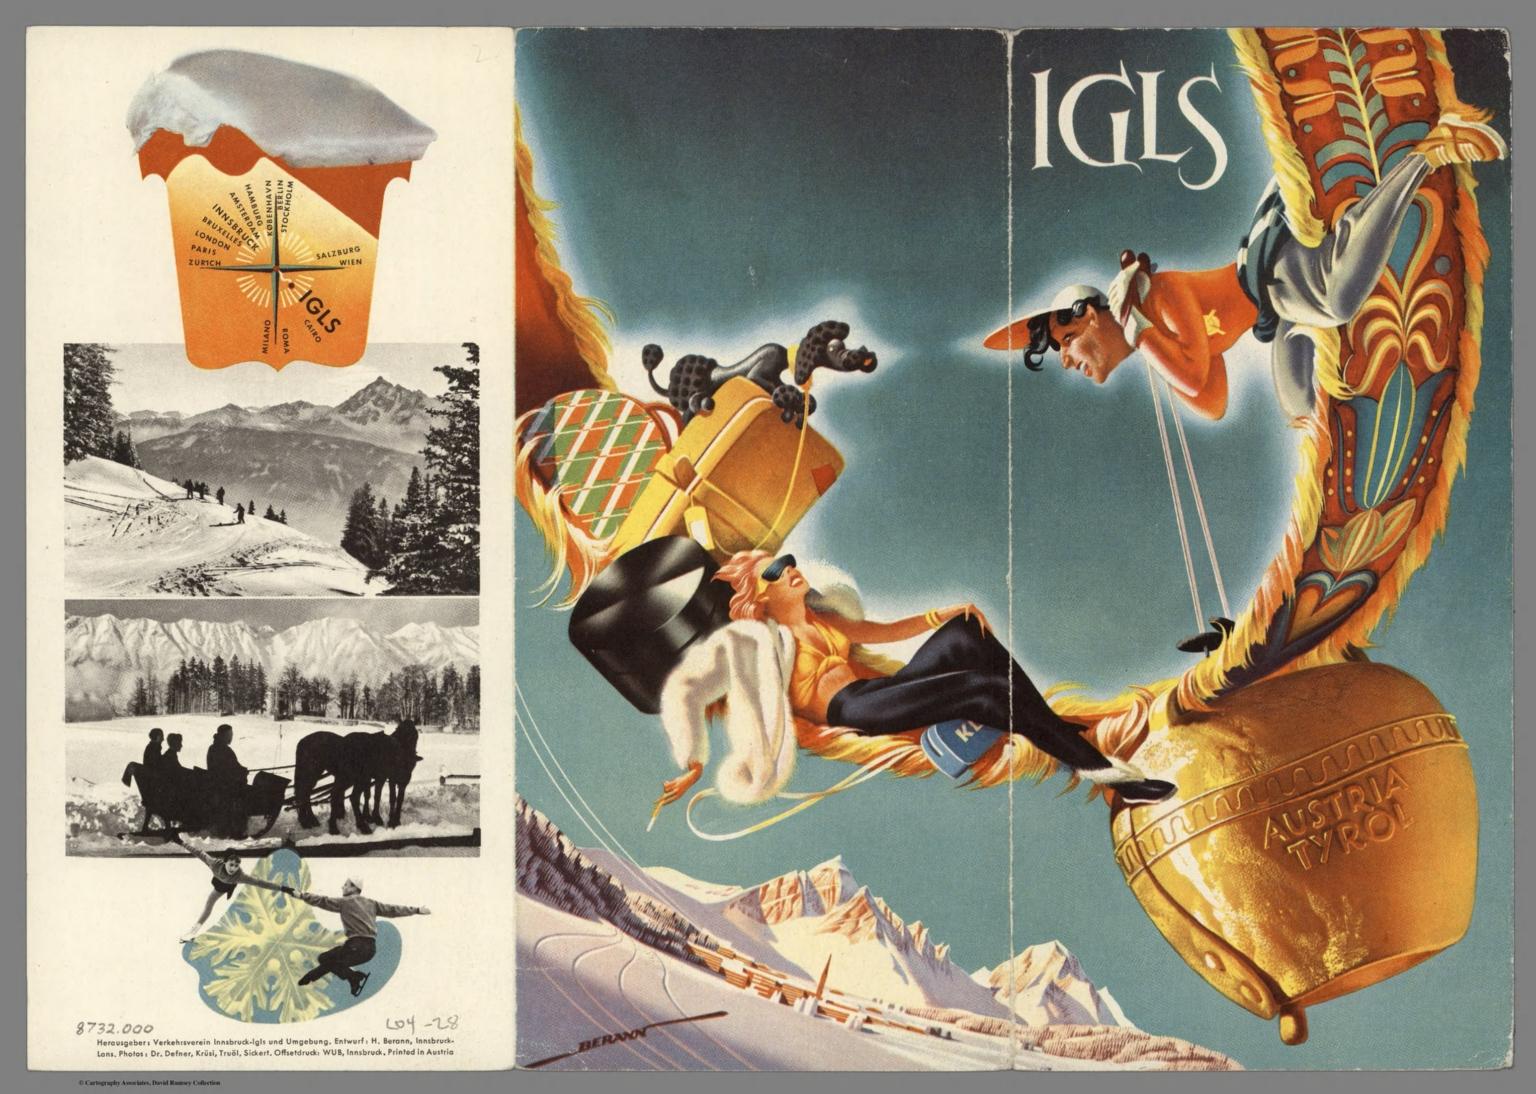 Covers: IGLS, Austria. - David Rumsey Historical Map Collection on austria ski map, eisenstadt austria map, lienz austria map, wattens austria map, leogang austria map, maria alm austria map, gmunden austria map, schladming austria map, mondsee austria map, durnstein austria map, seefeld austria map, schruns austria map, zell am see austria map, semmering austria map, zillertal austria map, gosau austria map, lofer austria map, bad gastein austria map, hall in tirol austria map, kirchberg austria map,